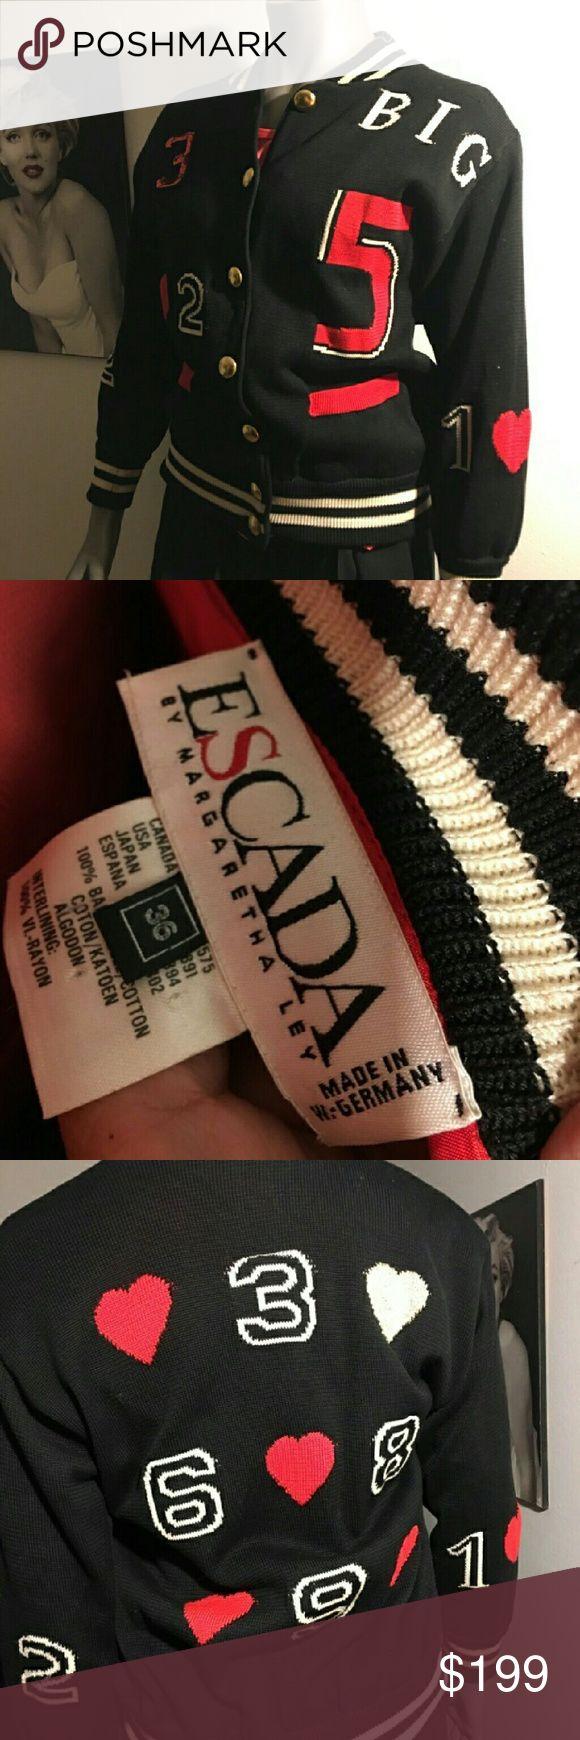 Vintage Escada Margaretha Ley Cotton Sweater Cardi Beautiful vintage cardigan sweater.size 36eu Escada Sweaters Cardigans